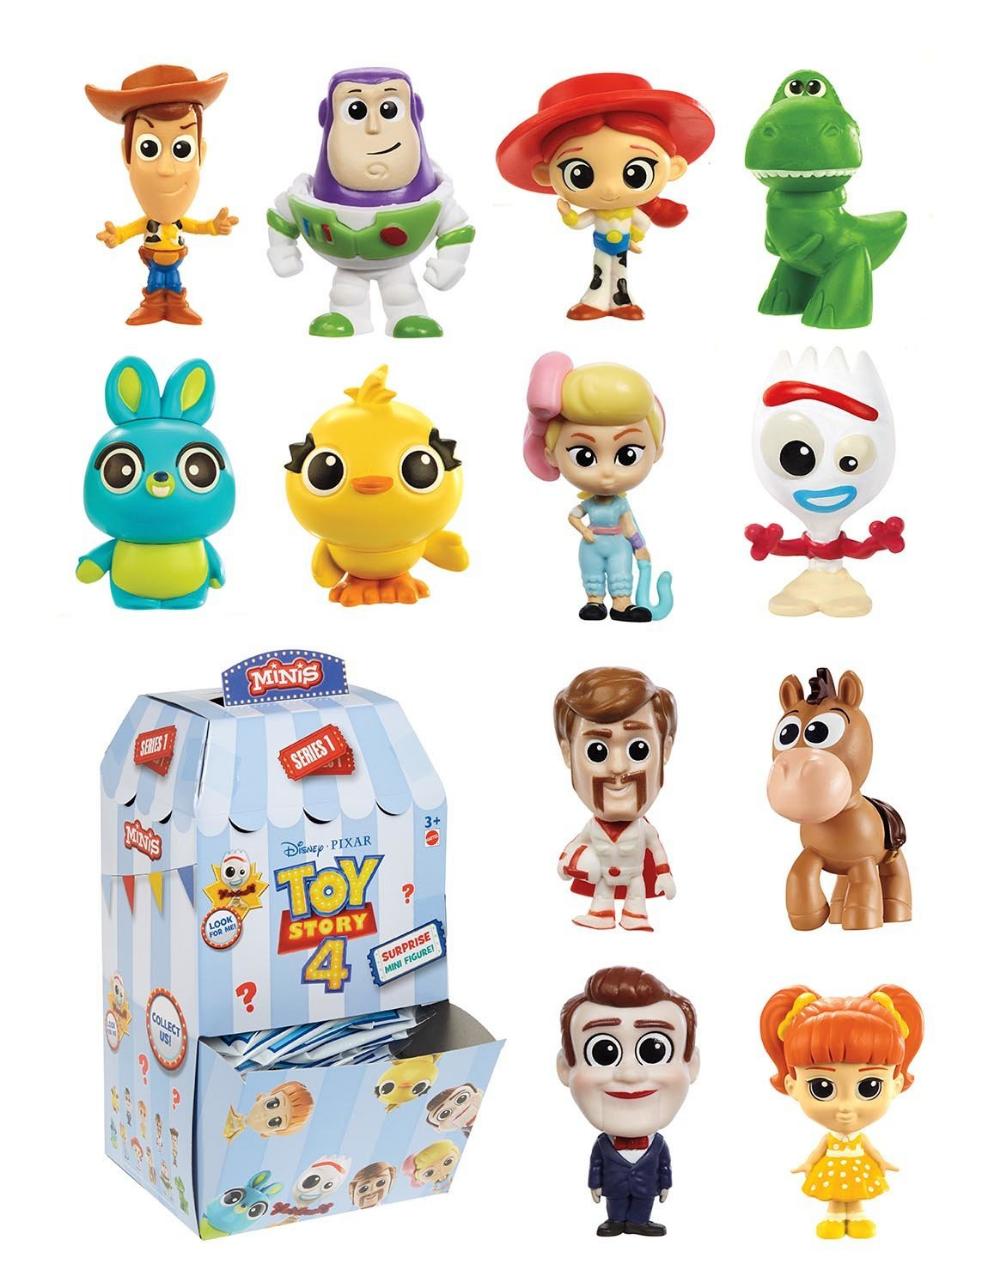 Disney Pixar Toy Story 4 Blind Bag Series 1 Bunny Figure NEW